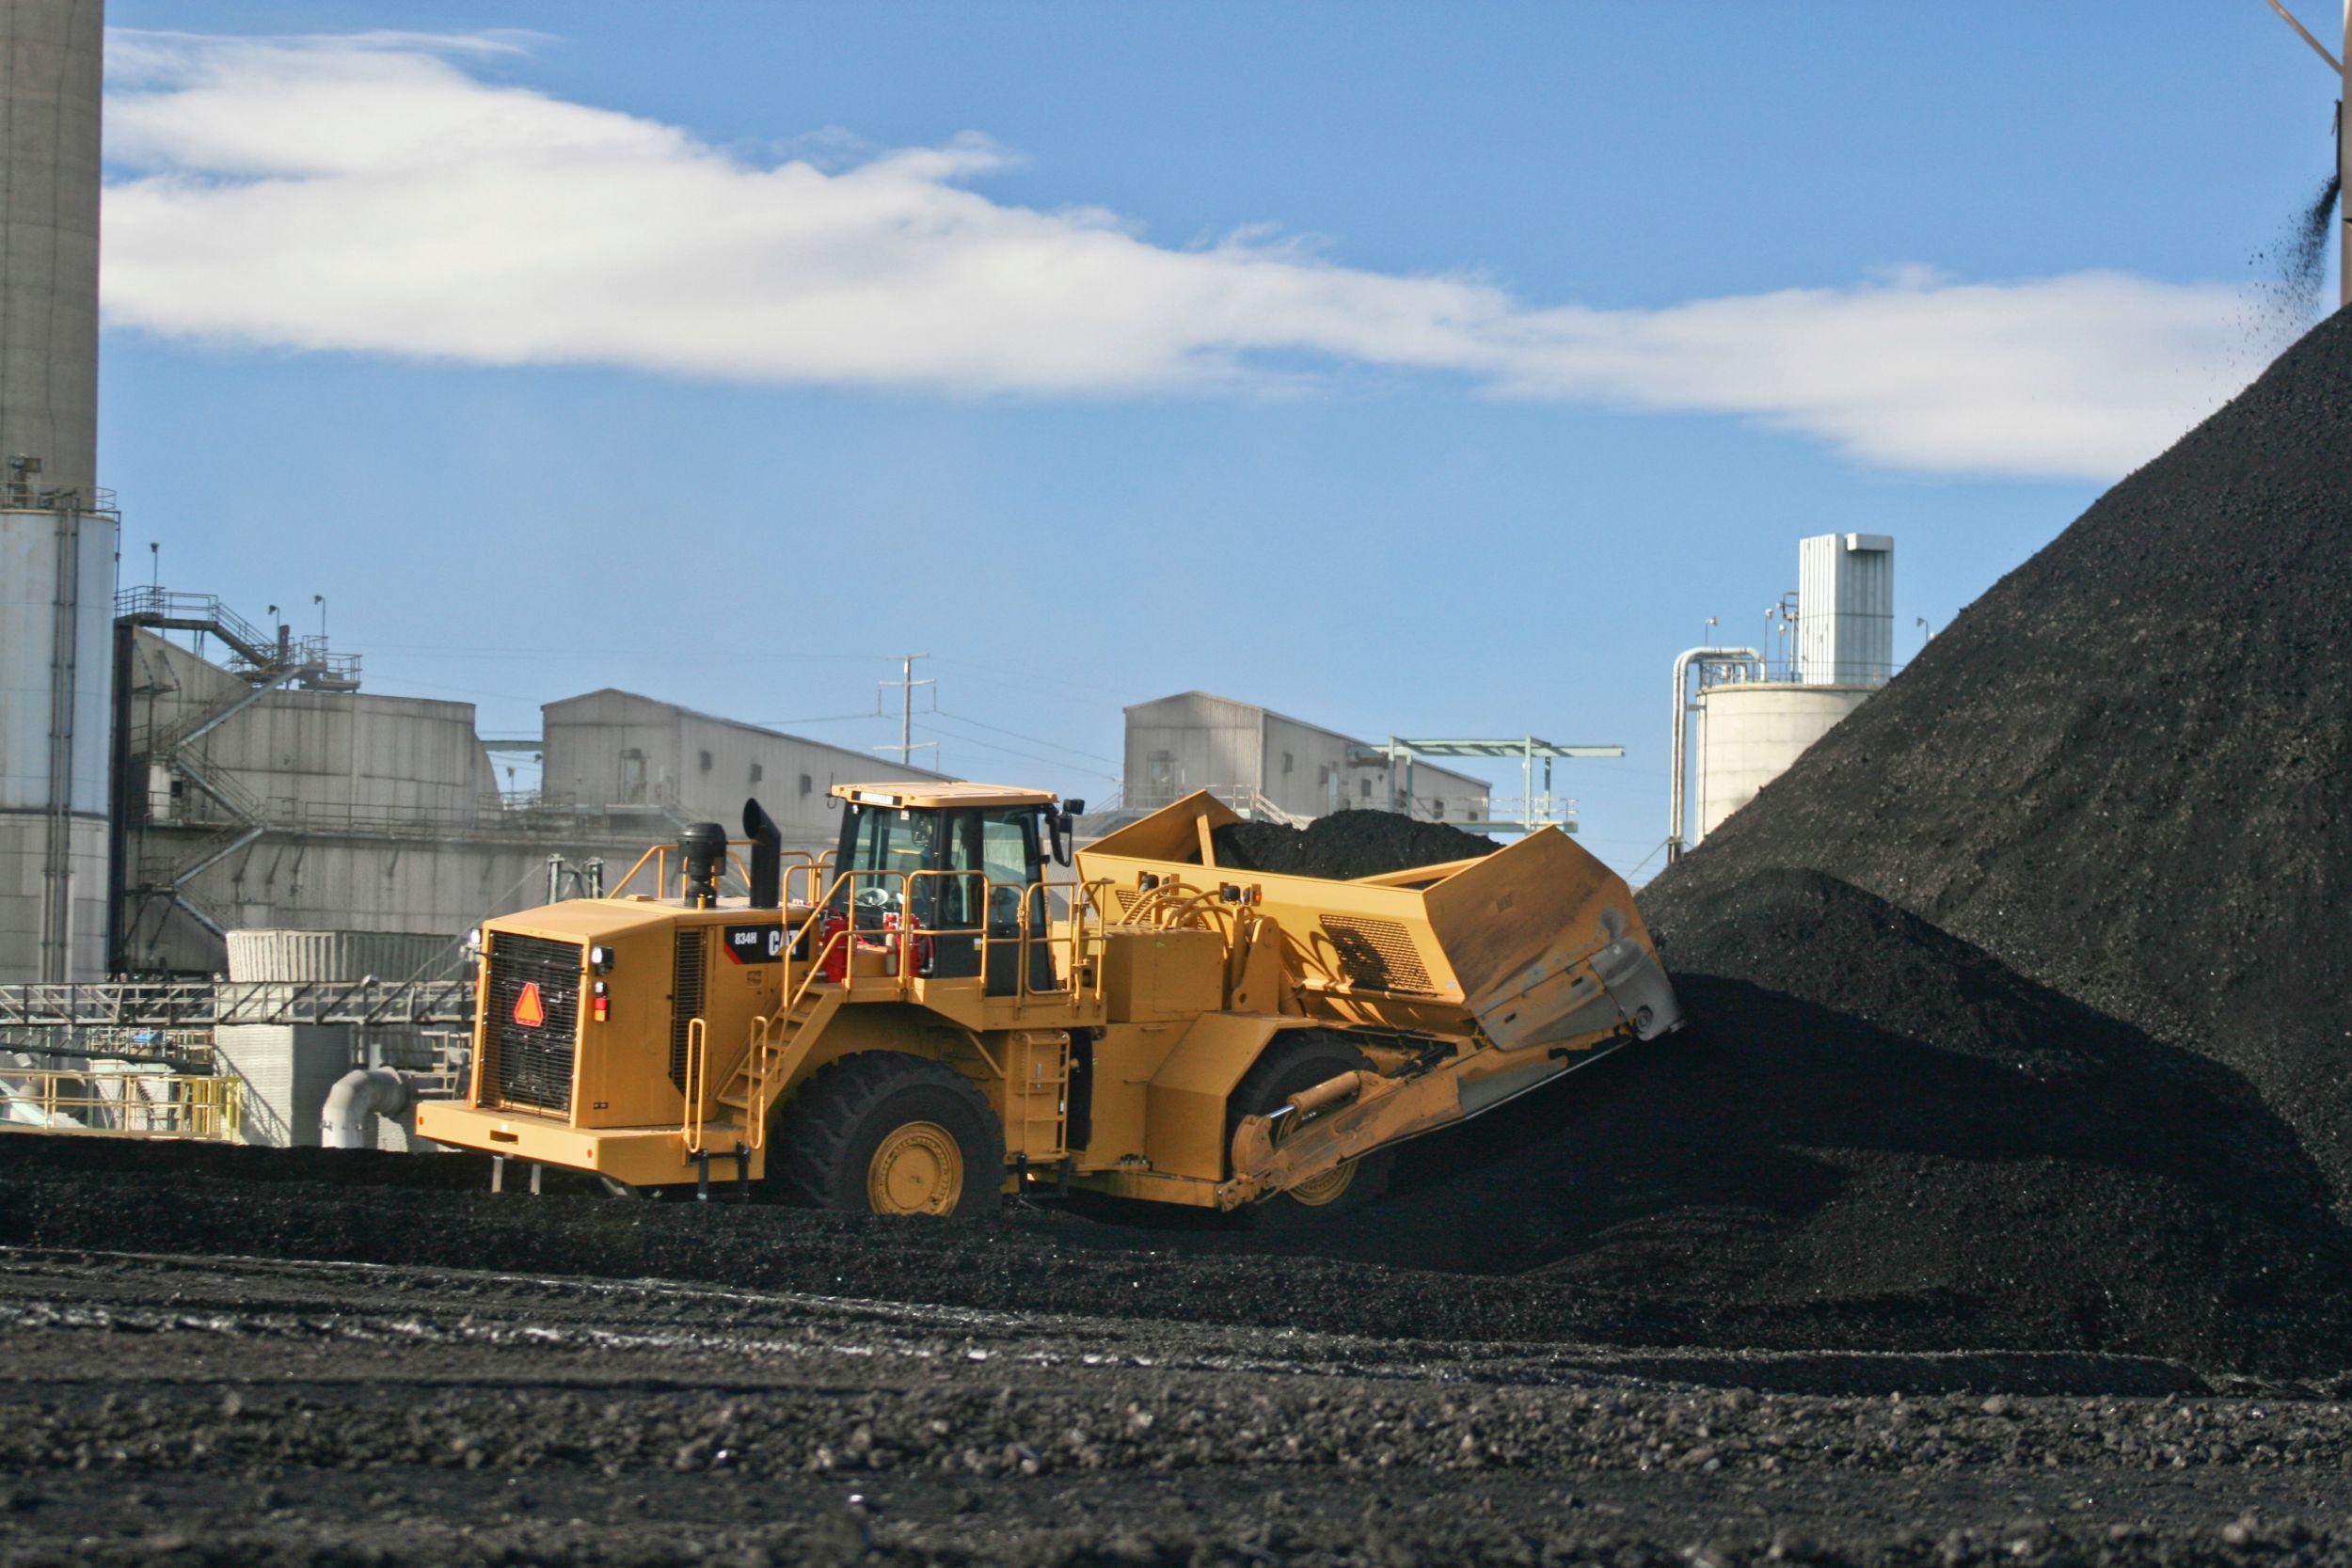 834H Coal Scoops Medium Wheel Dozers